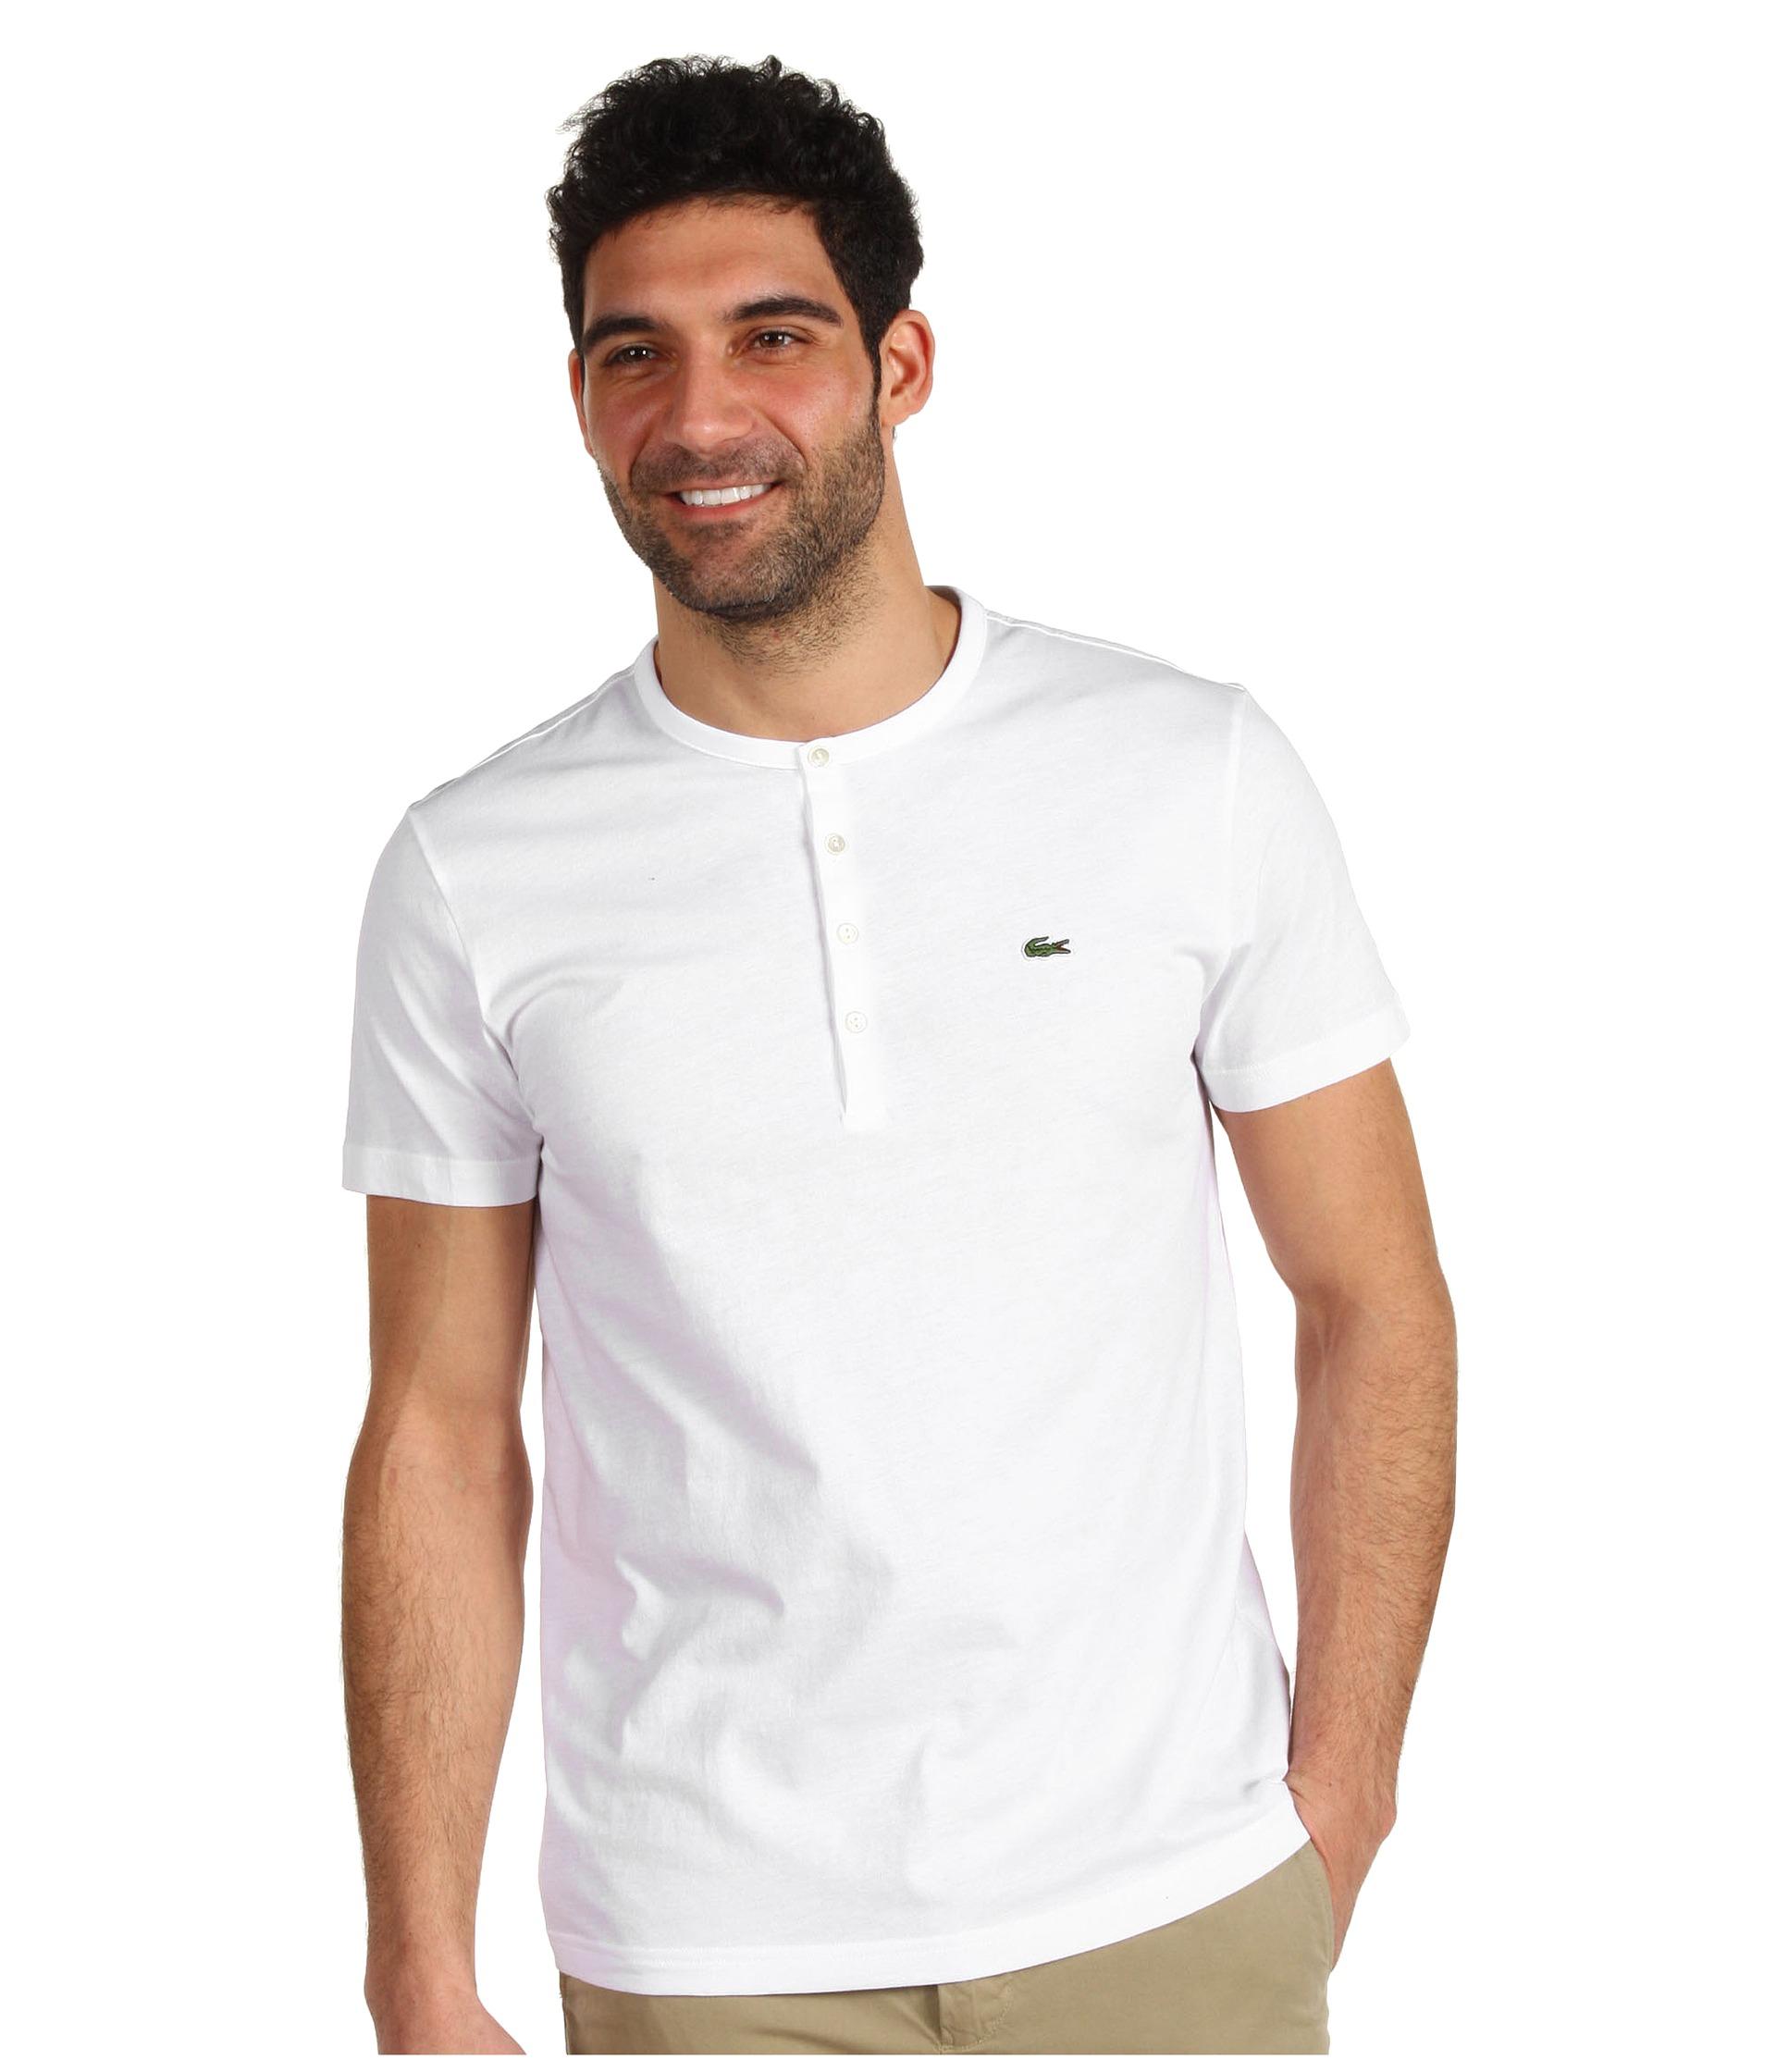 17647c187e3d2 Lyst - Lacoste S S Pima Cotton Henley T-Shirt in White for Men